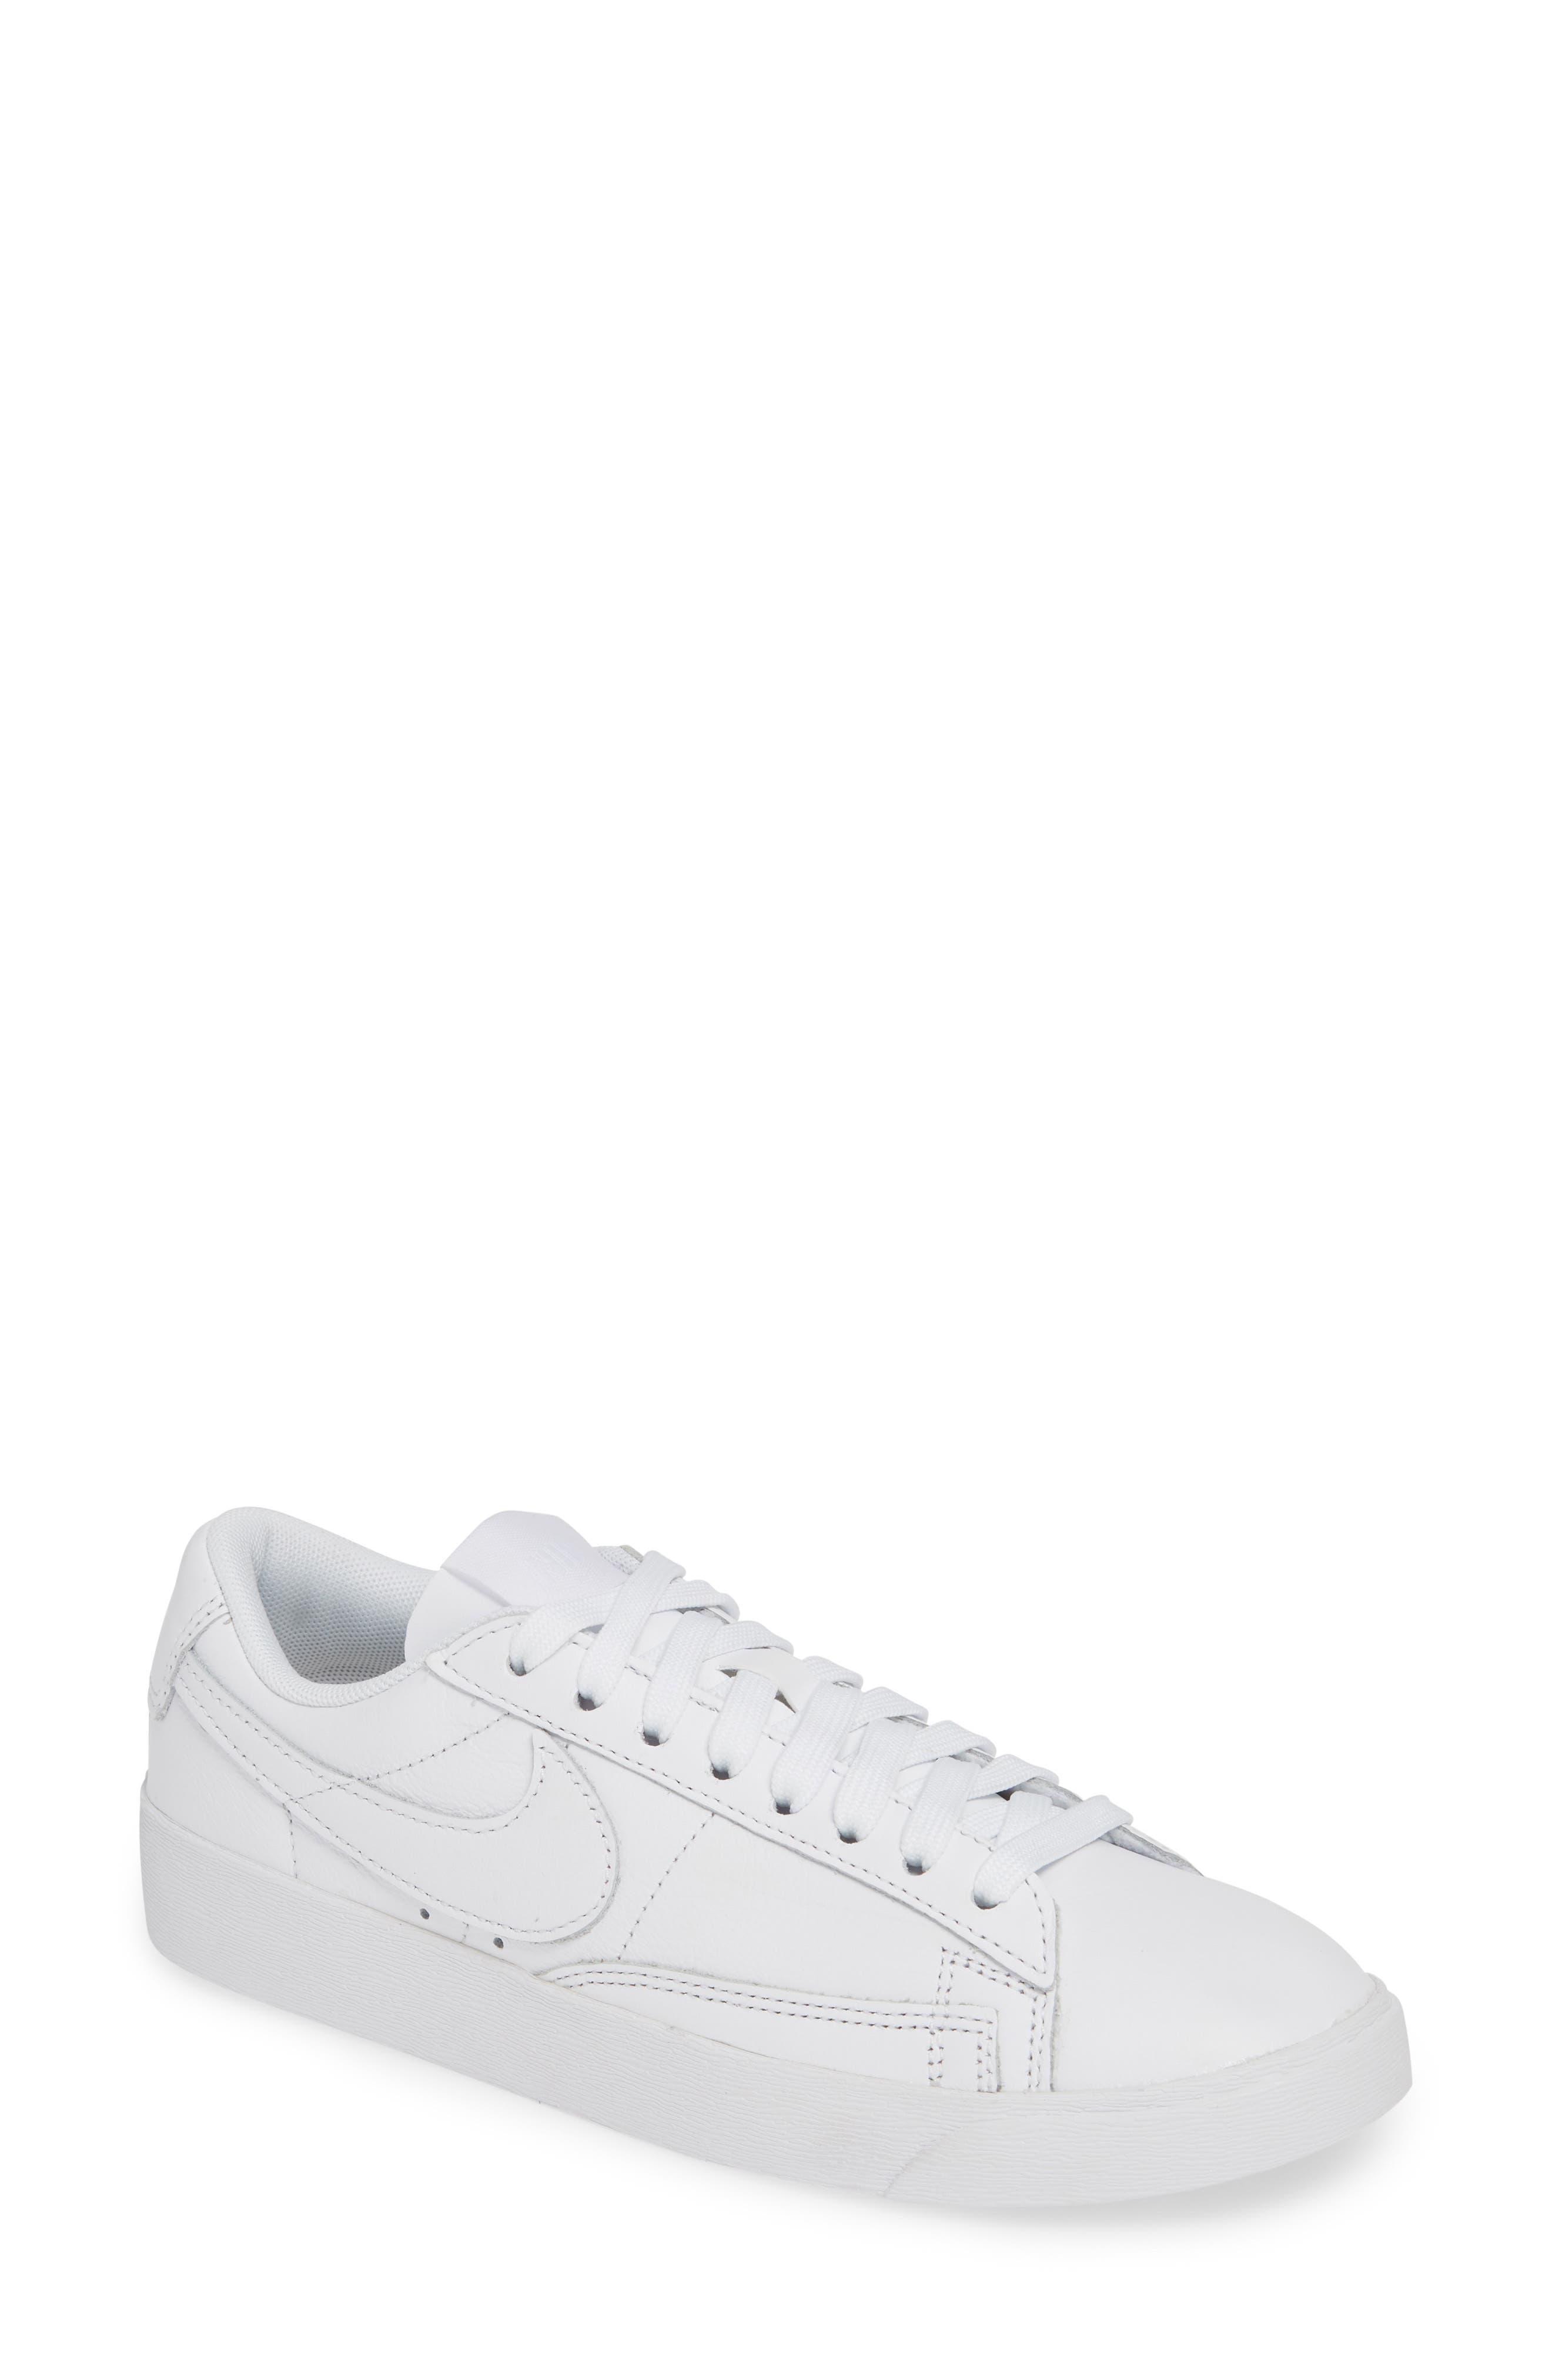 white nike low top sneakers